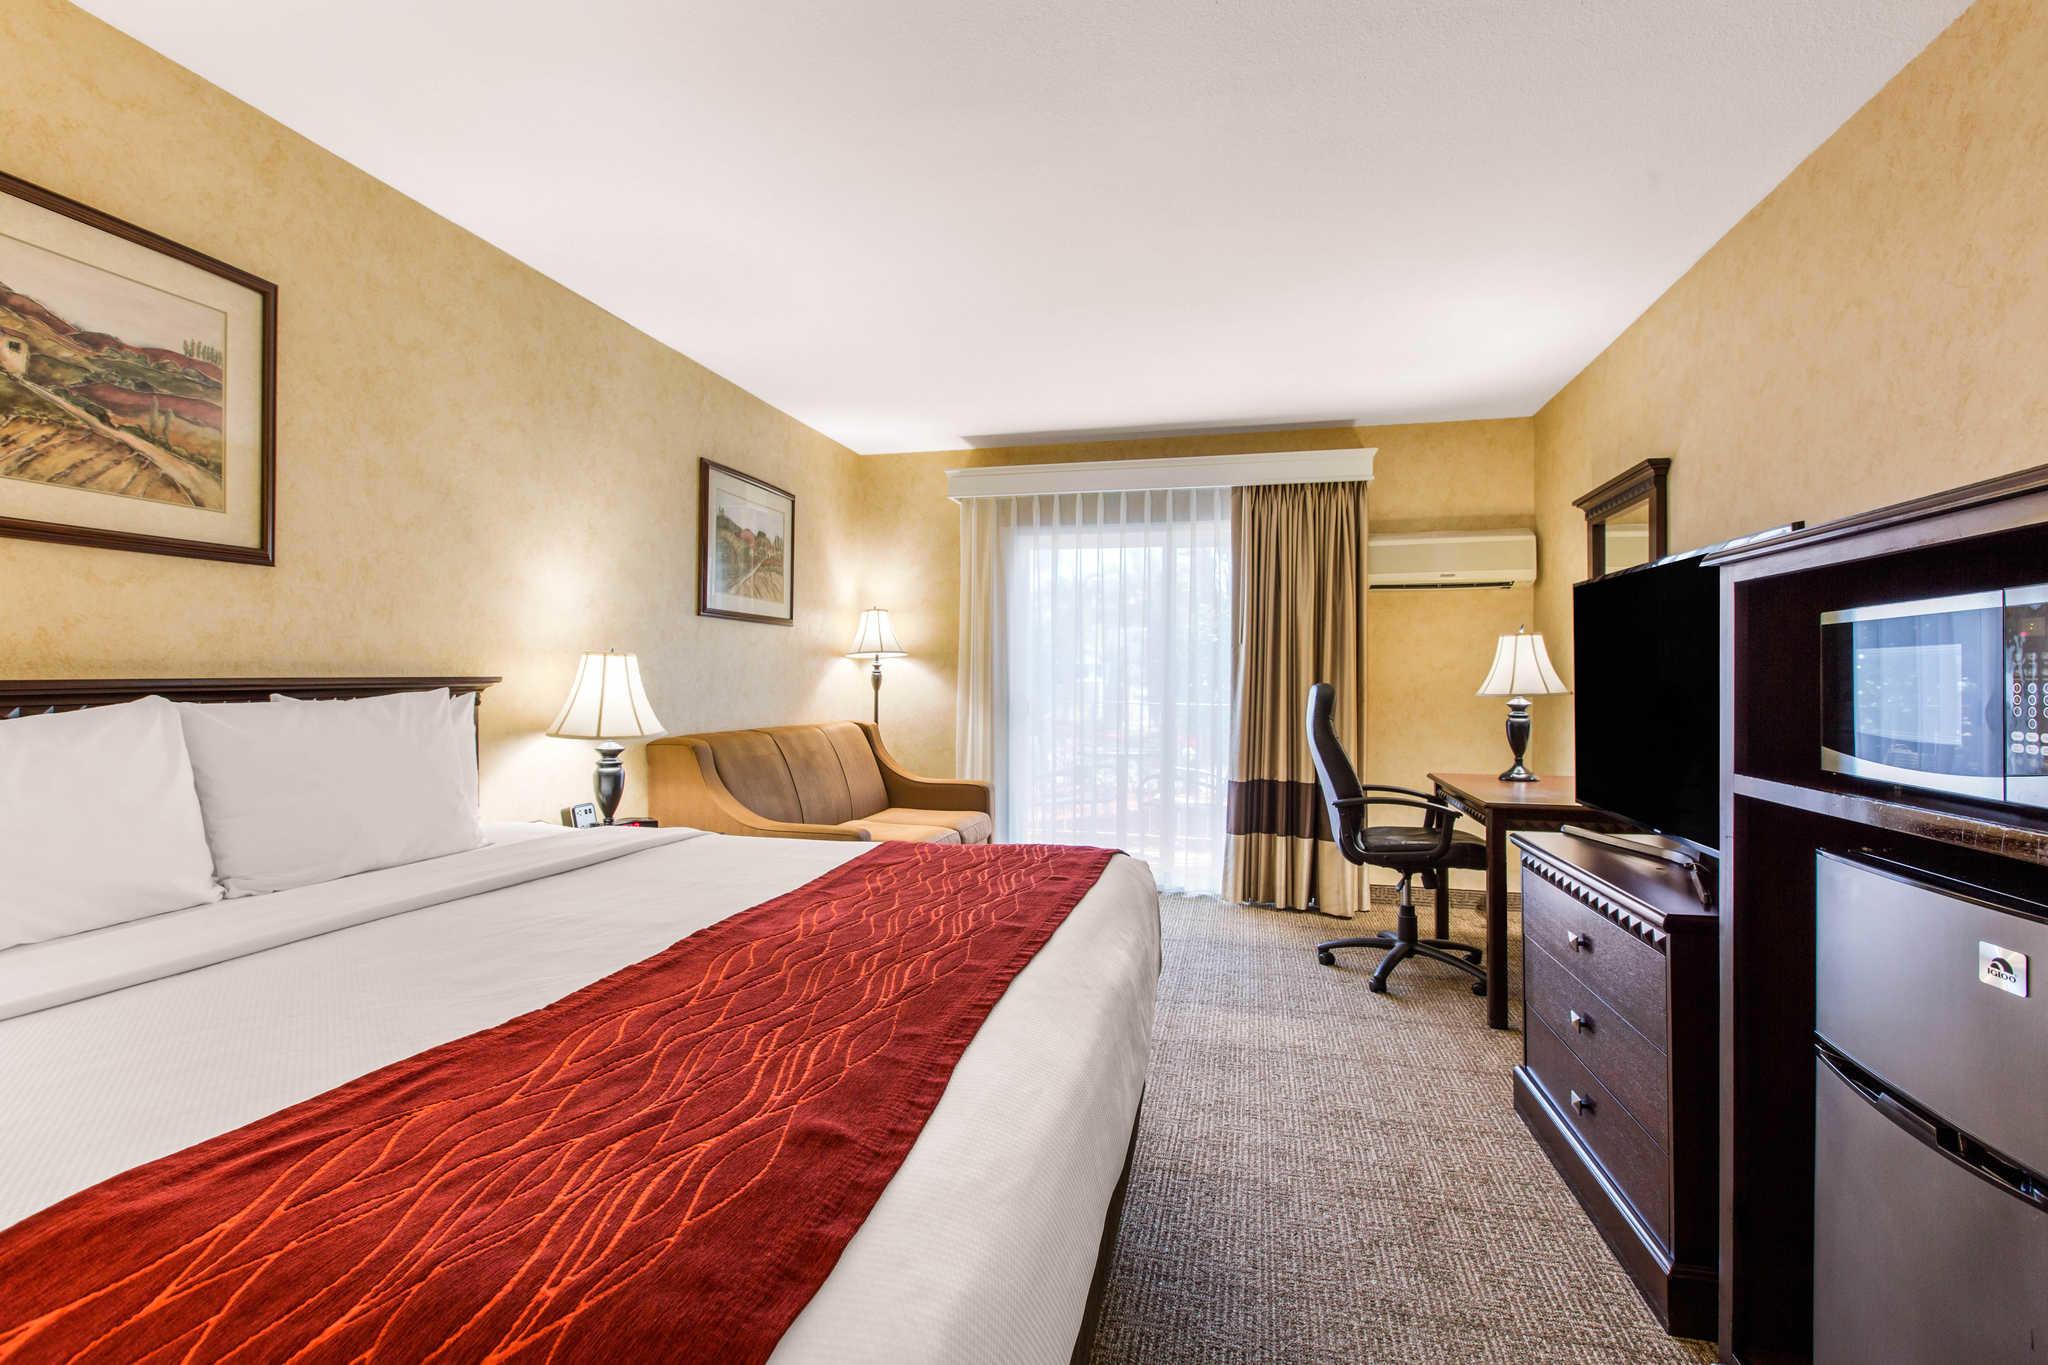 Rooms For Rent Near Escondido Ca